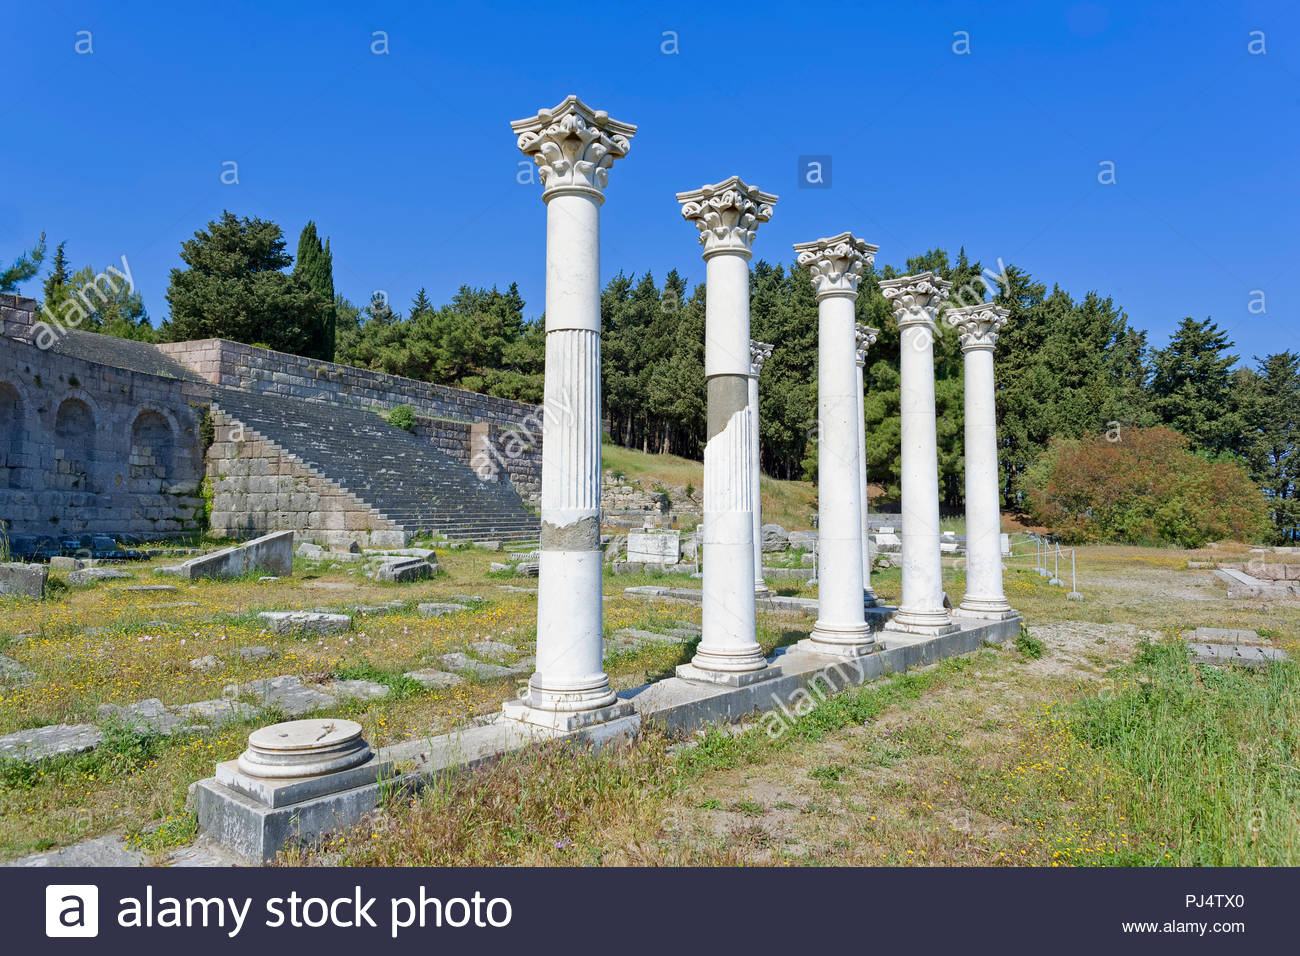 Temple of Apollo, The Asklepienon, Kos, Dodecanese Islands, Greece, Europe - Stock Image